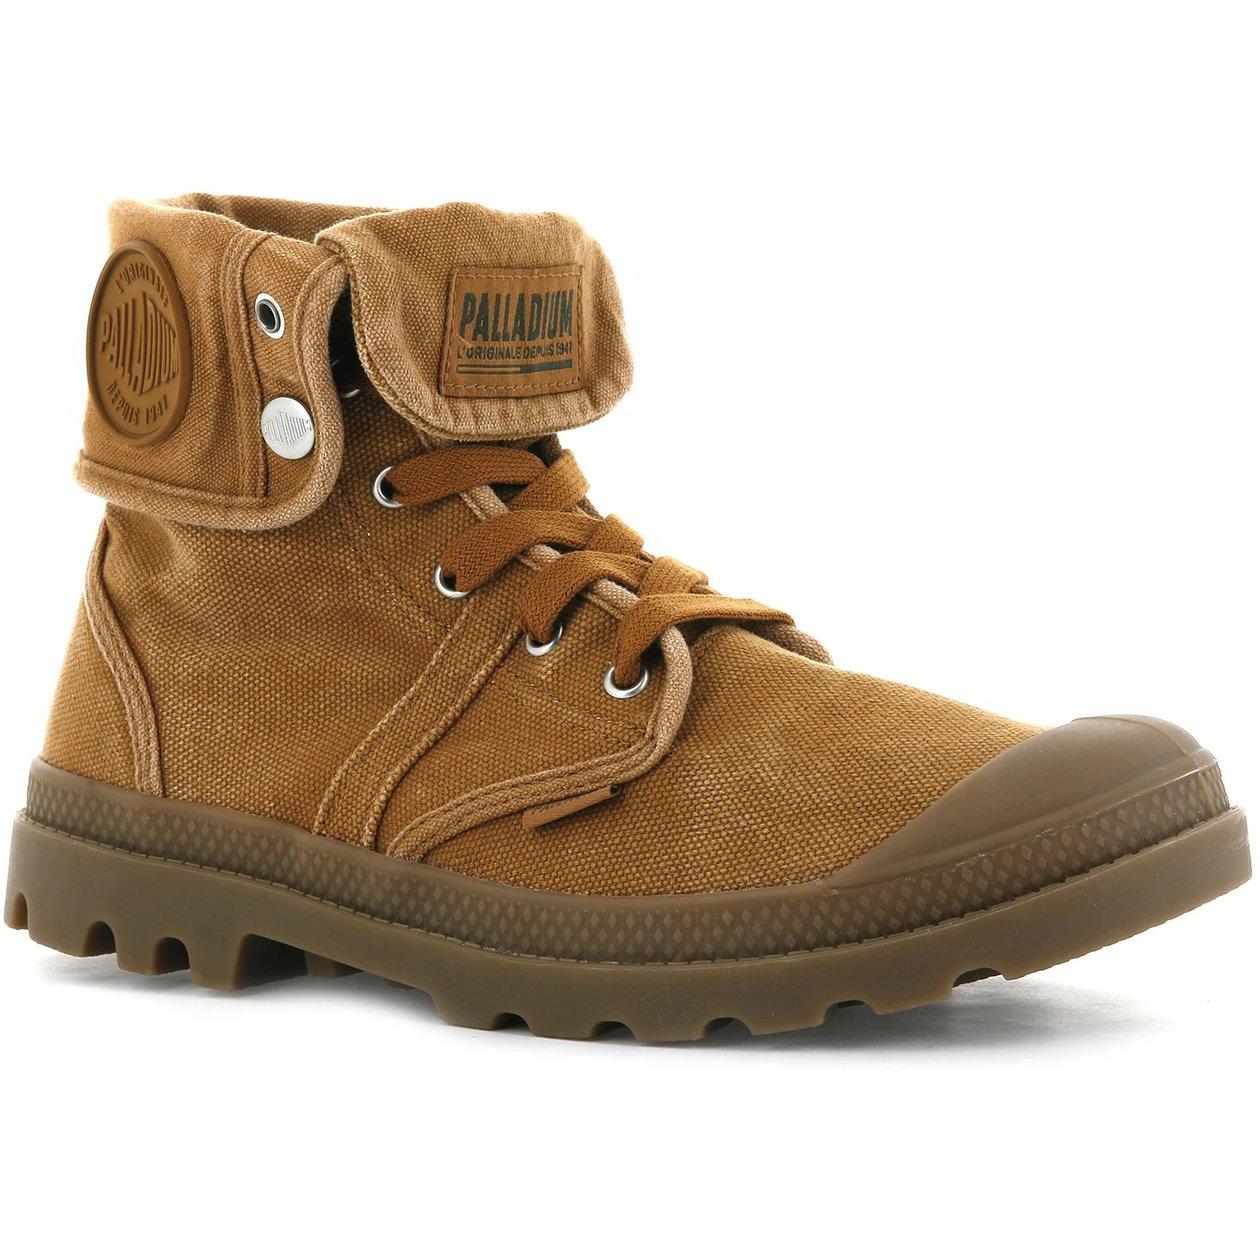 Palladium Pallabrouse Baggy Boots pour homme